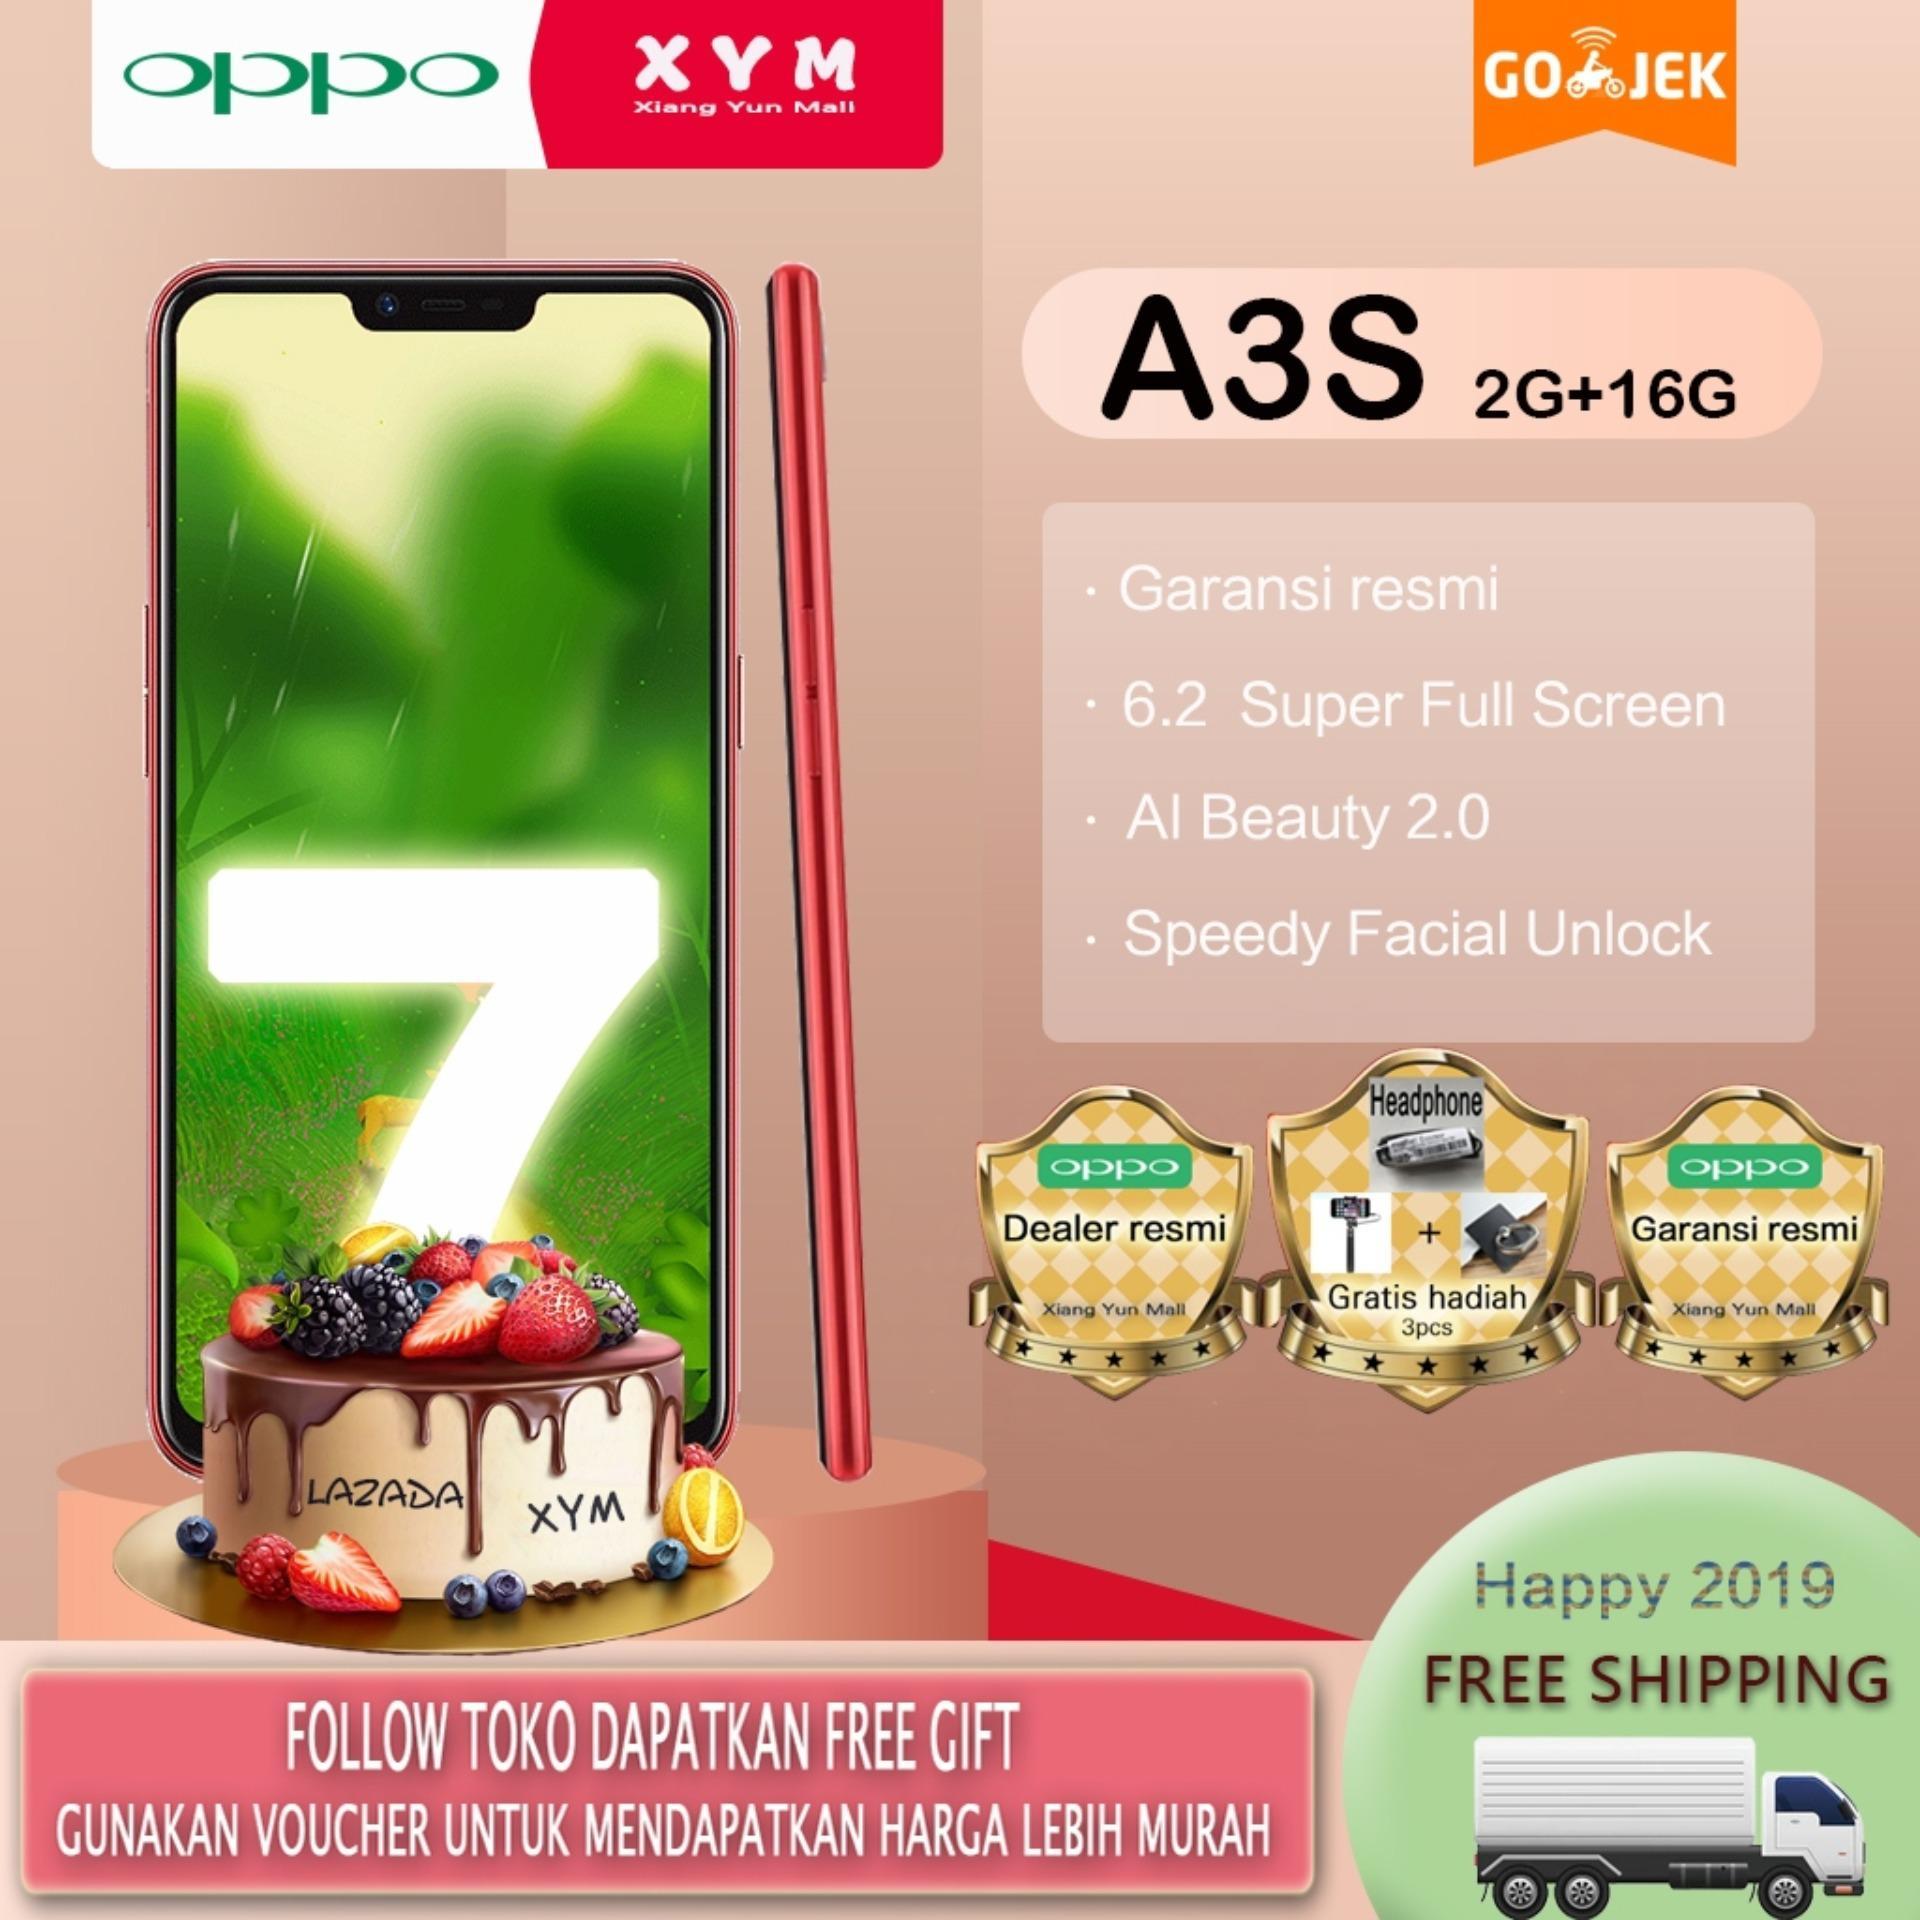 OPPO A3s hp 2G/16G - COD, Gratis Ongkir, 6.2 Super Full Screen, Speedy Facial Unlock, Garansi resmi [ Please use the voucher ]